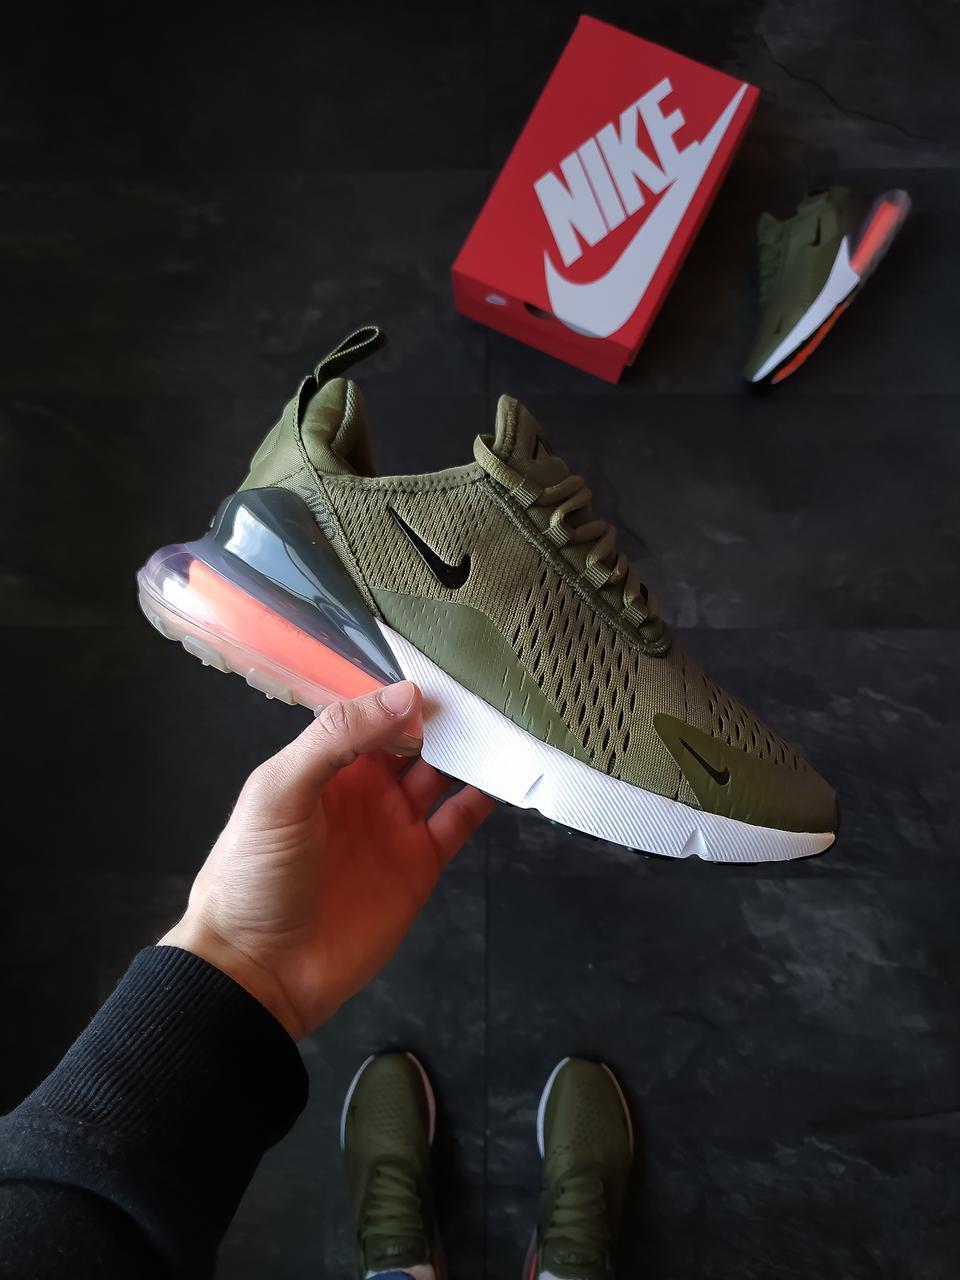 Nike Air 270 мужские Хаки / Оливковый